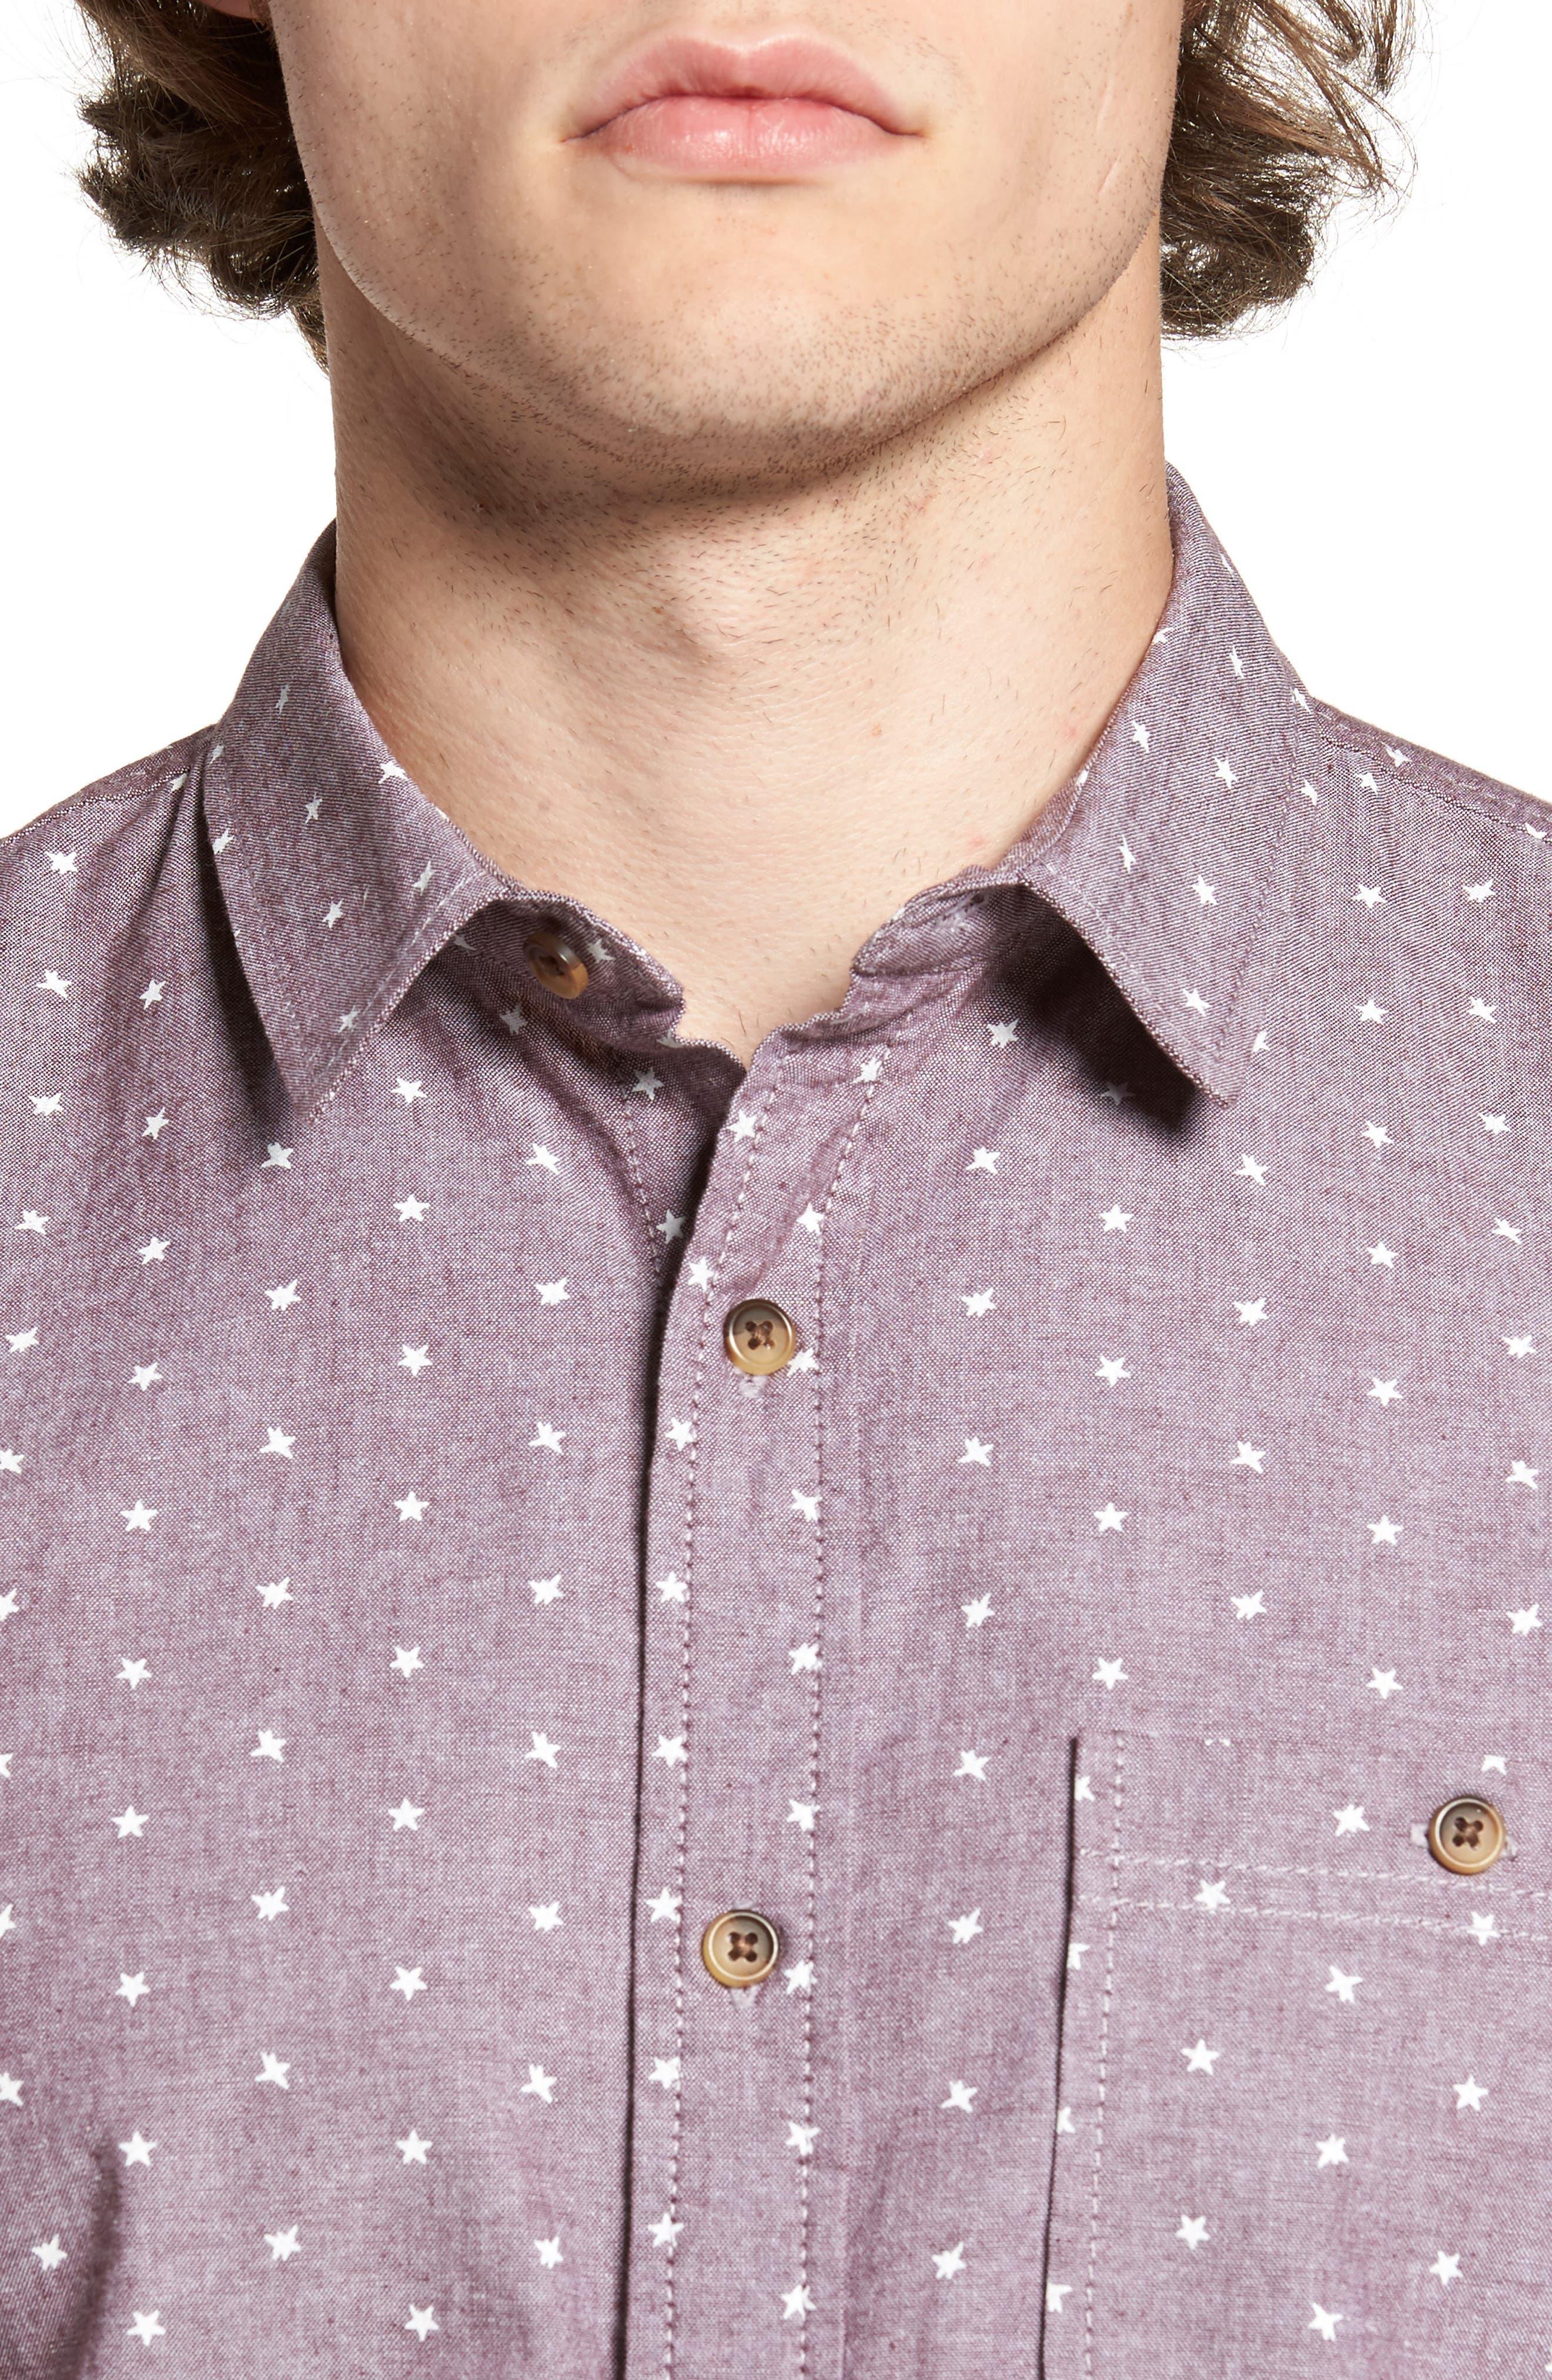 Star Chambray Shirt,                             Alternate thumbnail 4, color,                             Burgundy Stem Stars Print